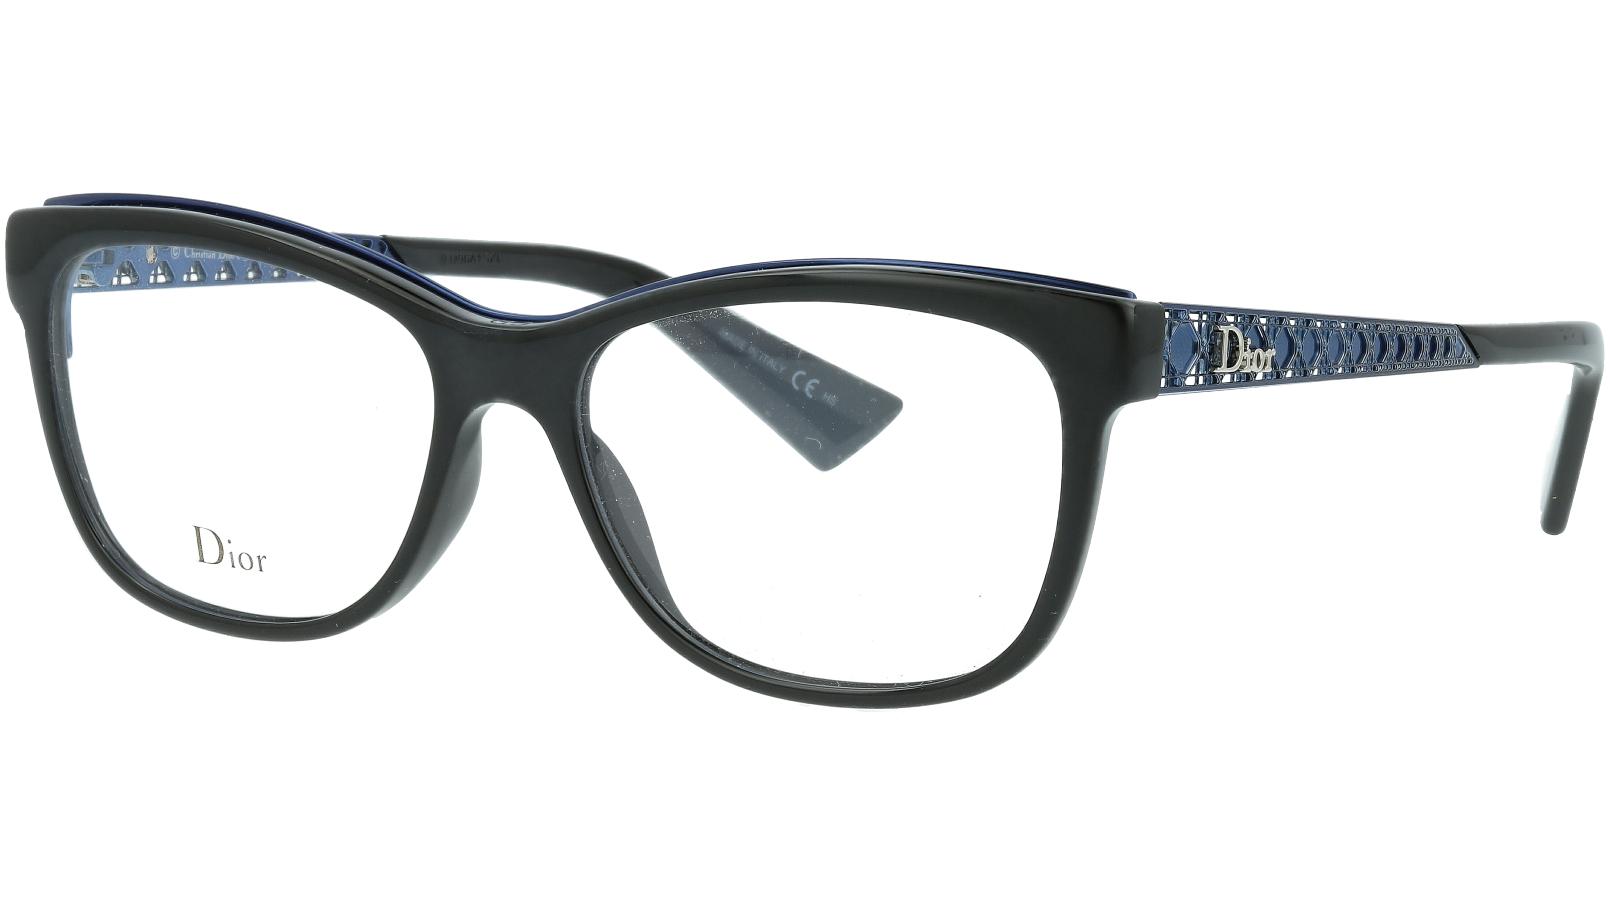 Dior AMAO1 EMV 53 Black Glasses